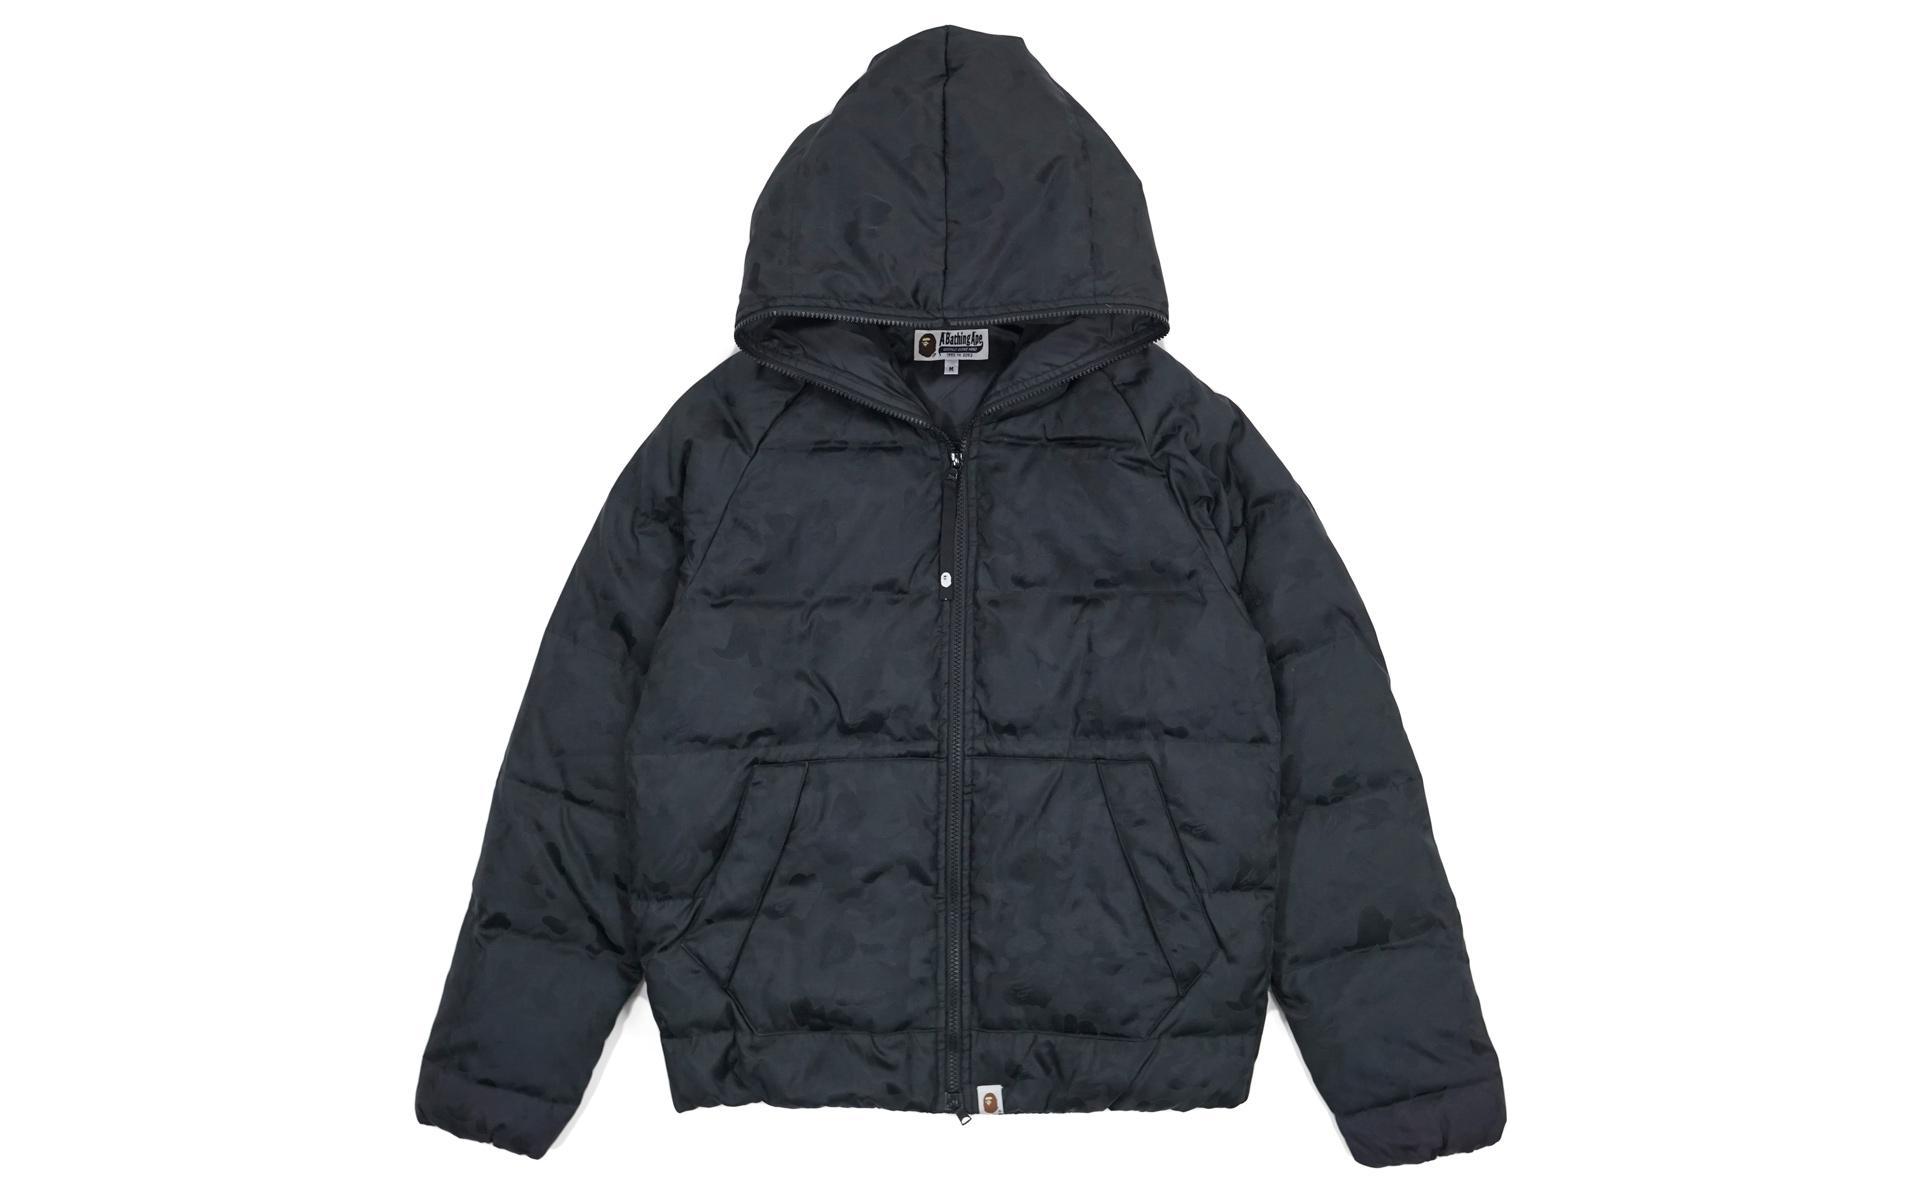 c48c18490d23 Lyst - A Bathing Ape Jacquard Camo Full Zip Nylon Down Jacket Black ...